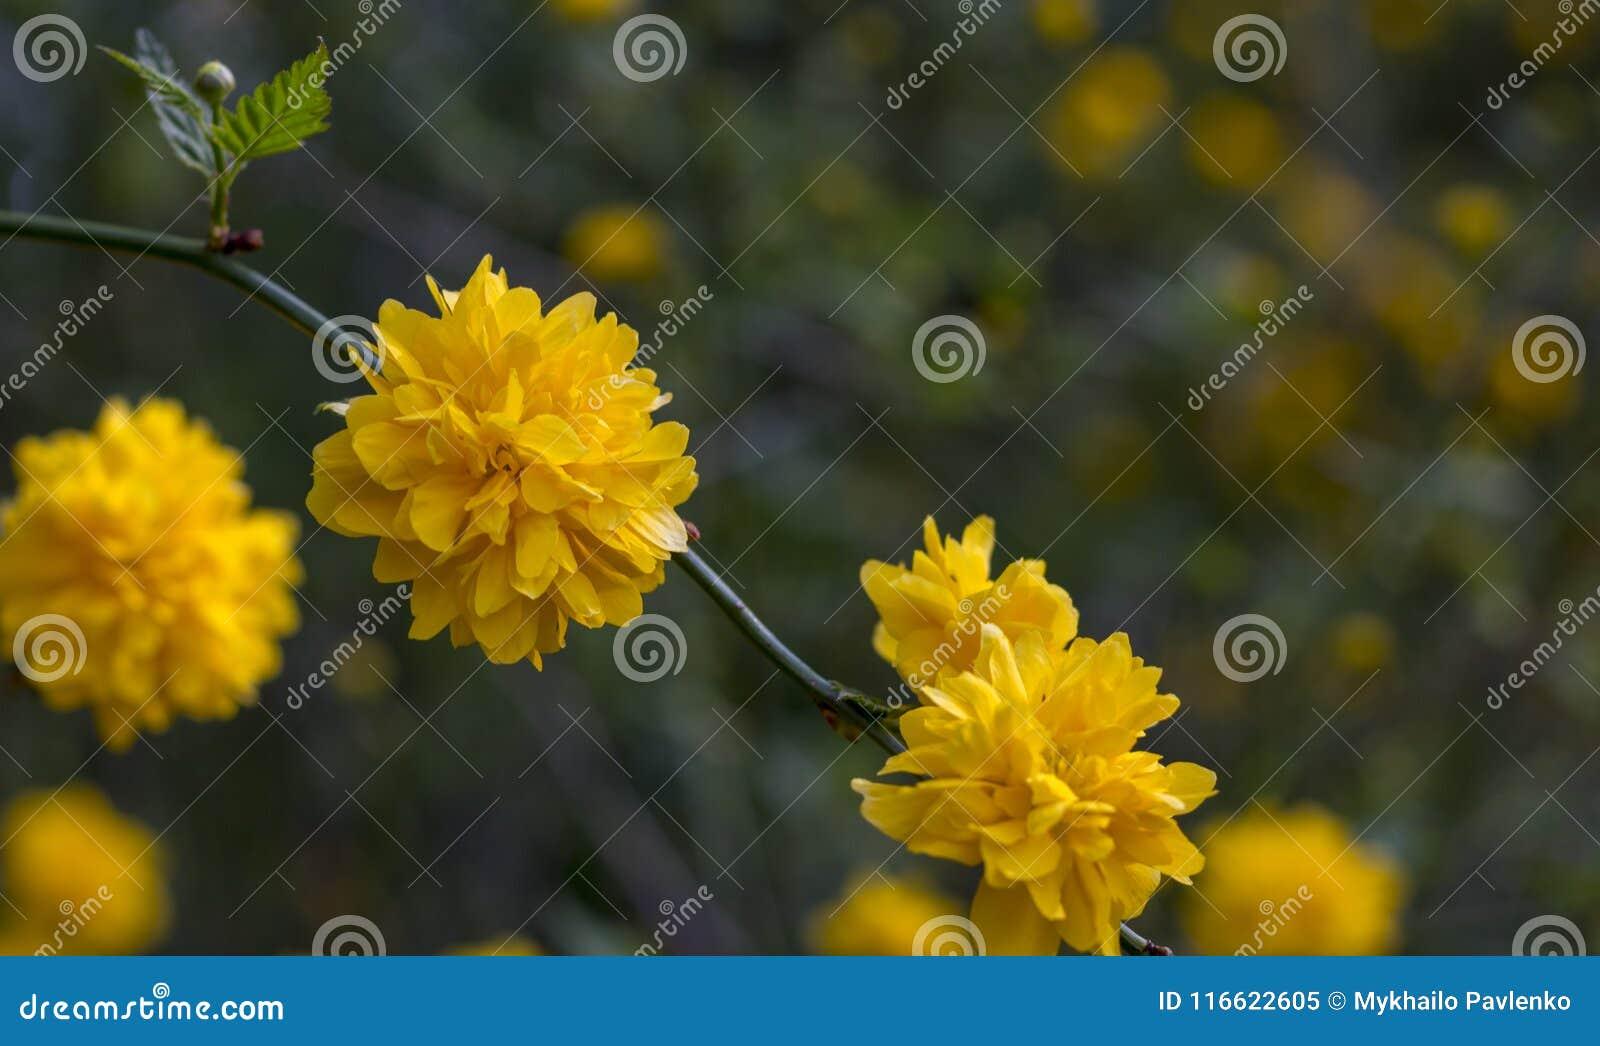 Kerria Japonica A Beautiful Yellow Flowering Shrub Stock Image